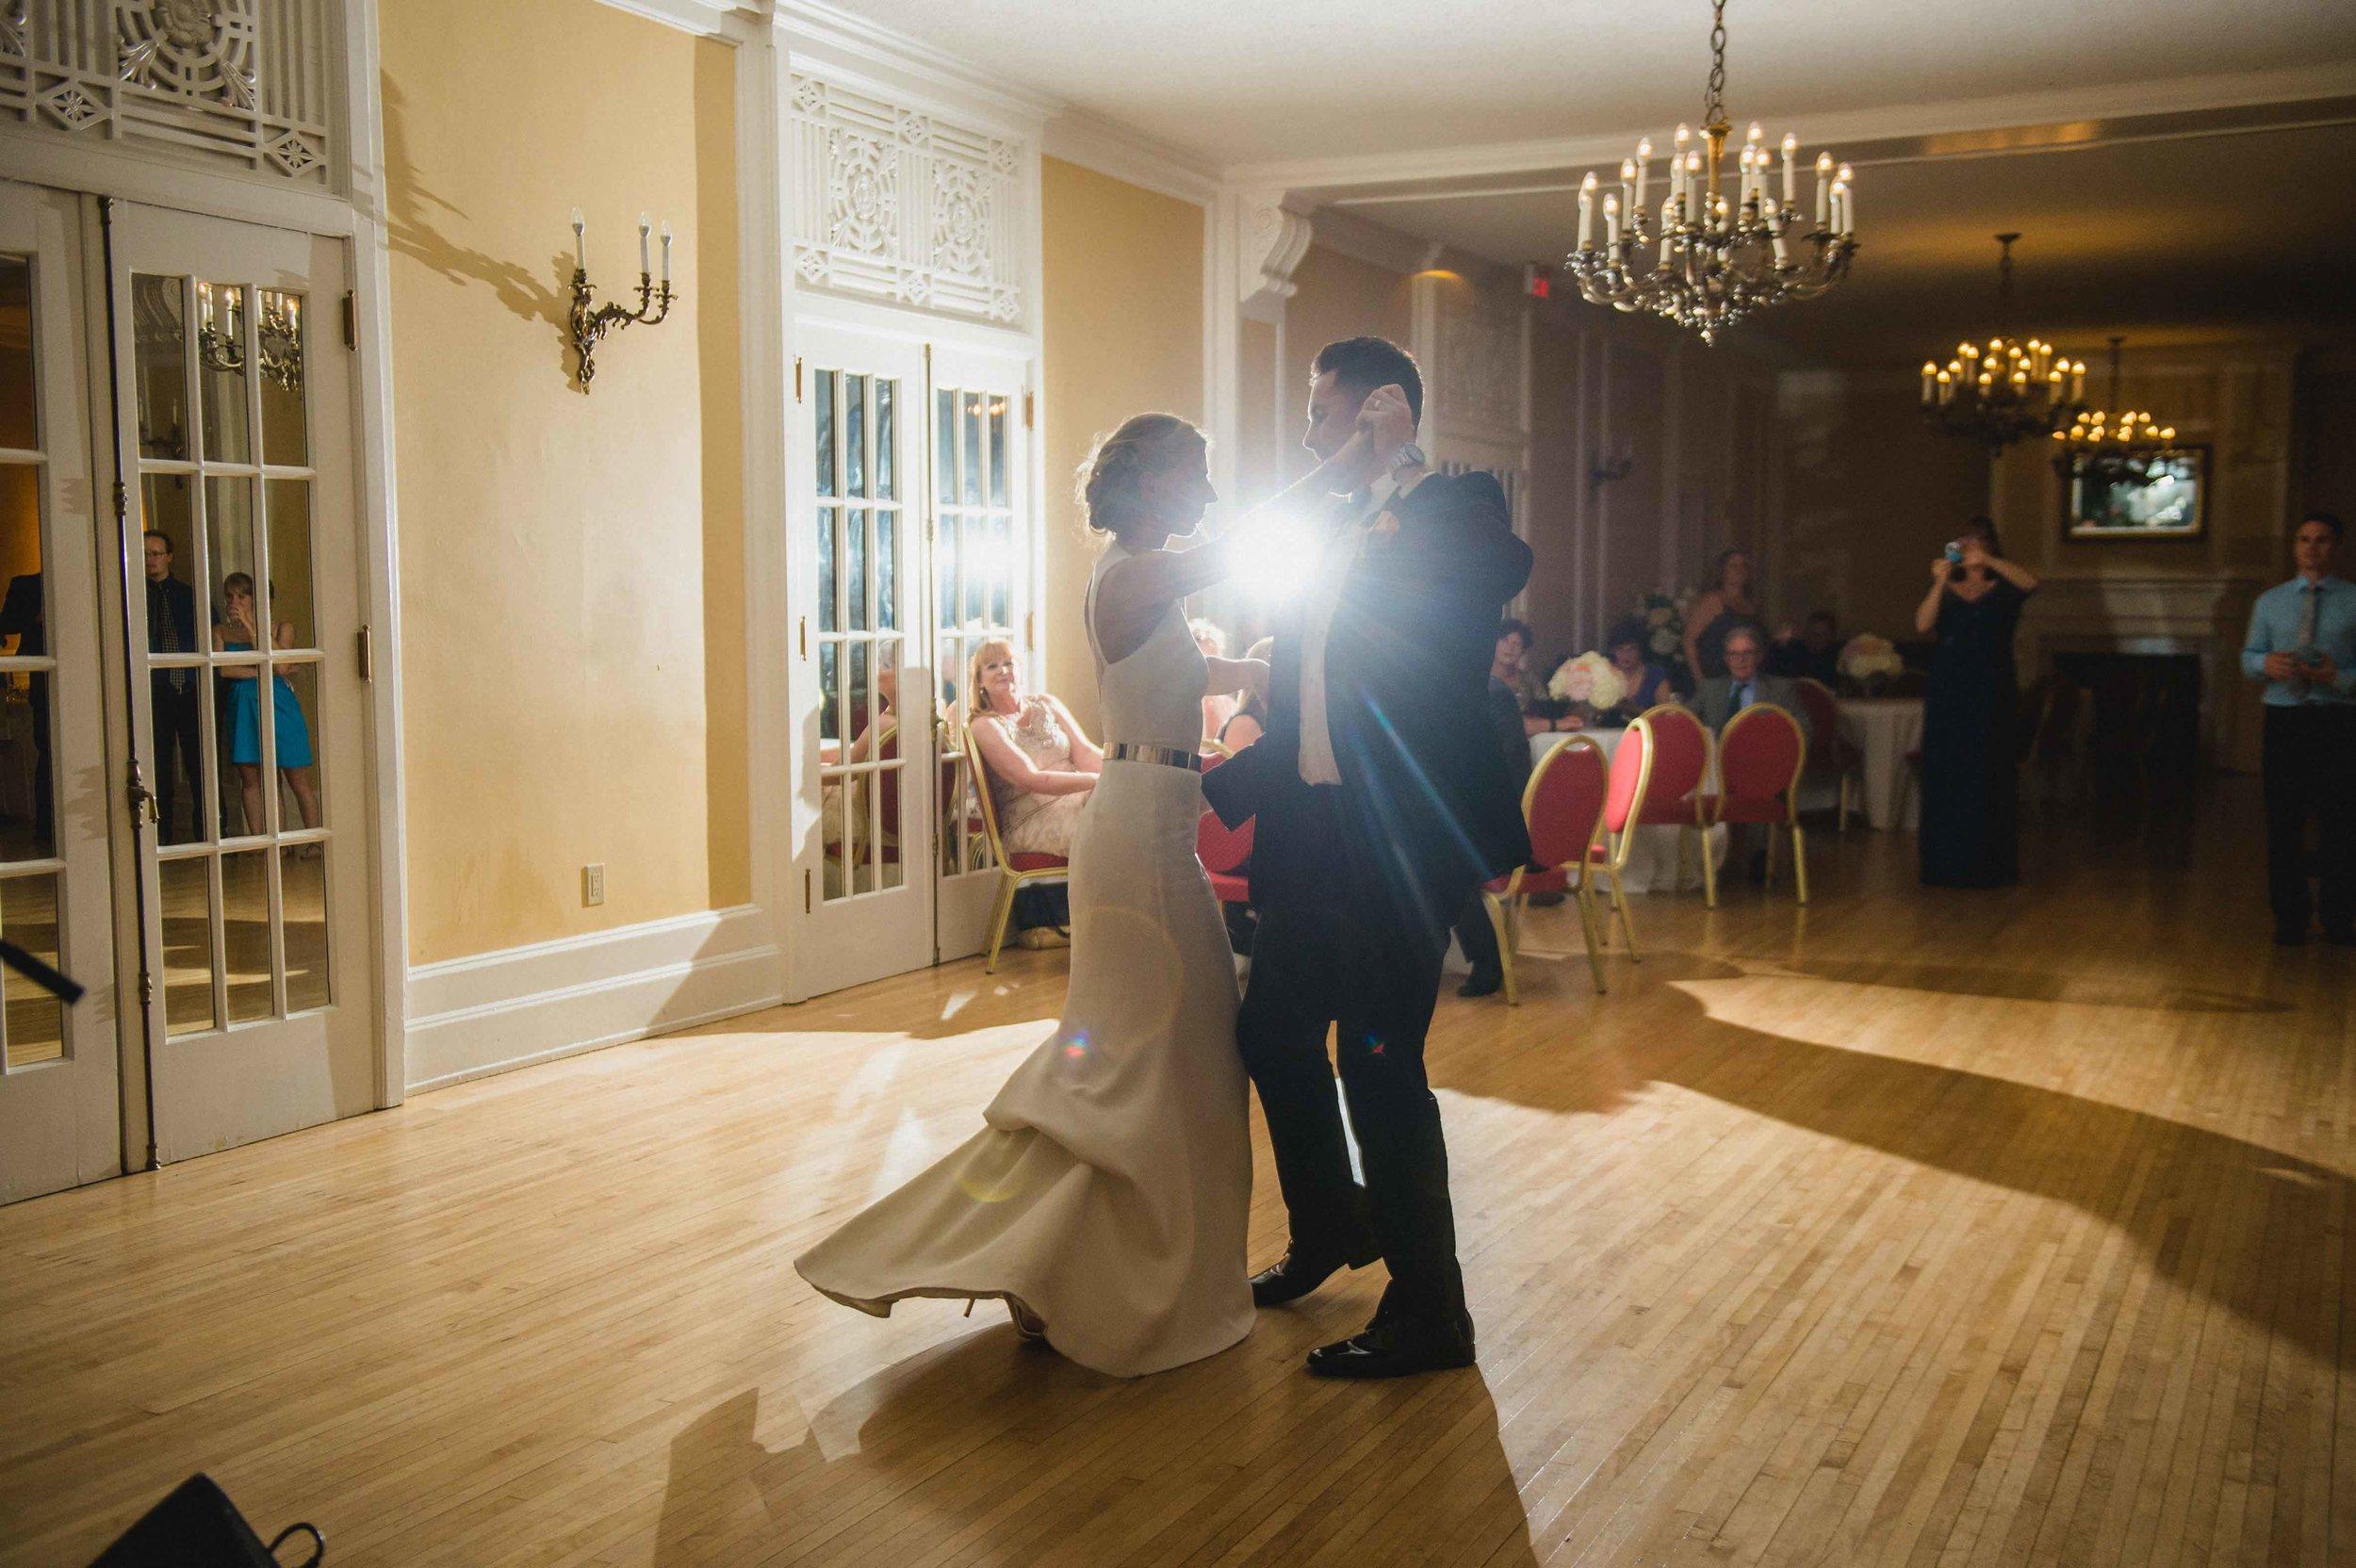 vancouver-hycroft-wedding-photographer-edward-lai-photography-28.jpg